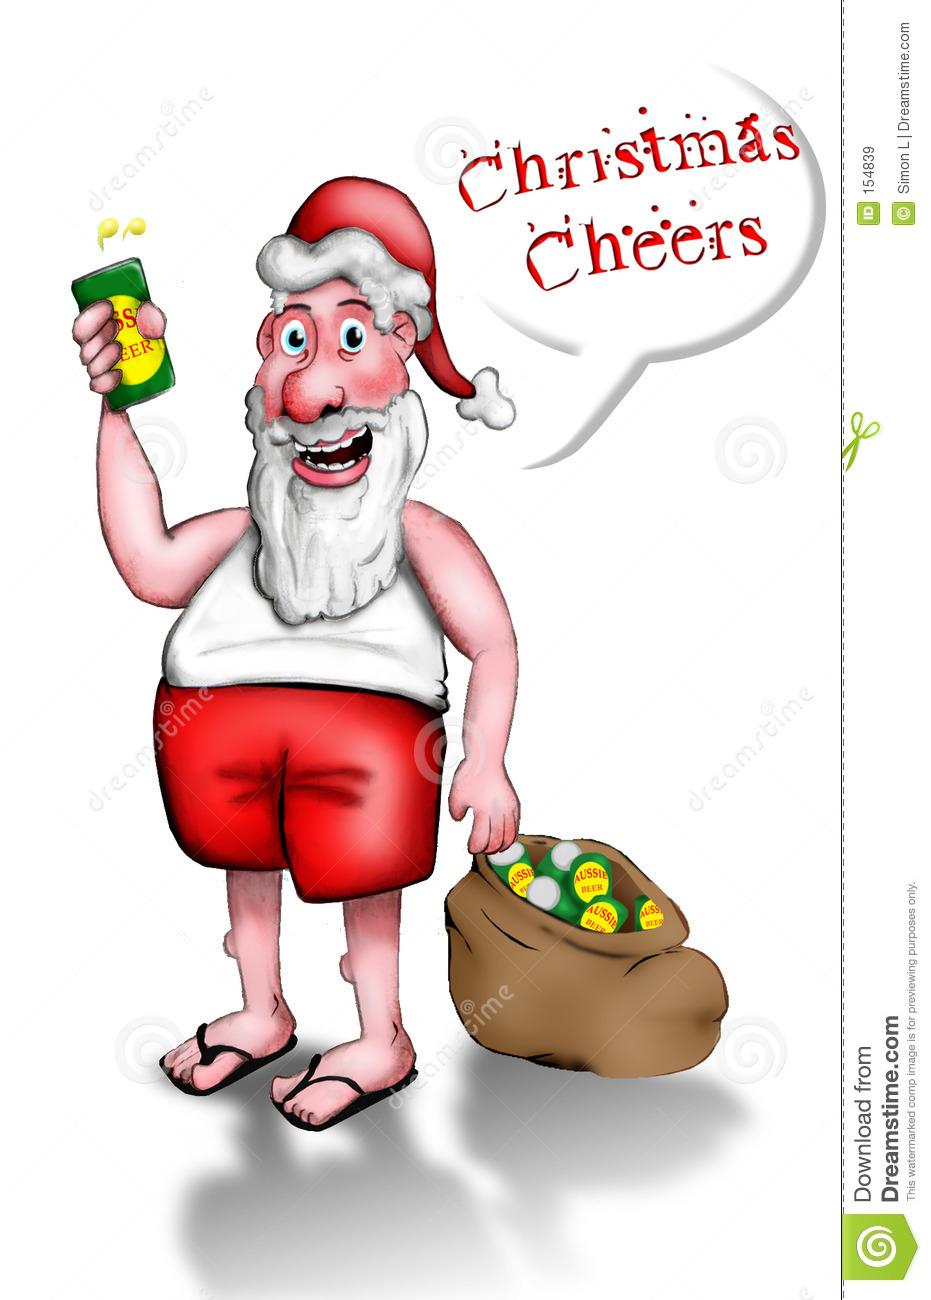 Merry Christmas clipart australian Santa santa clipart free clipart